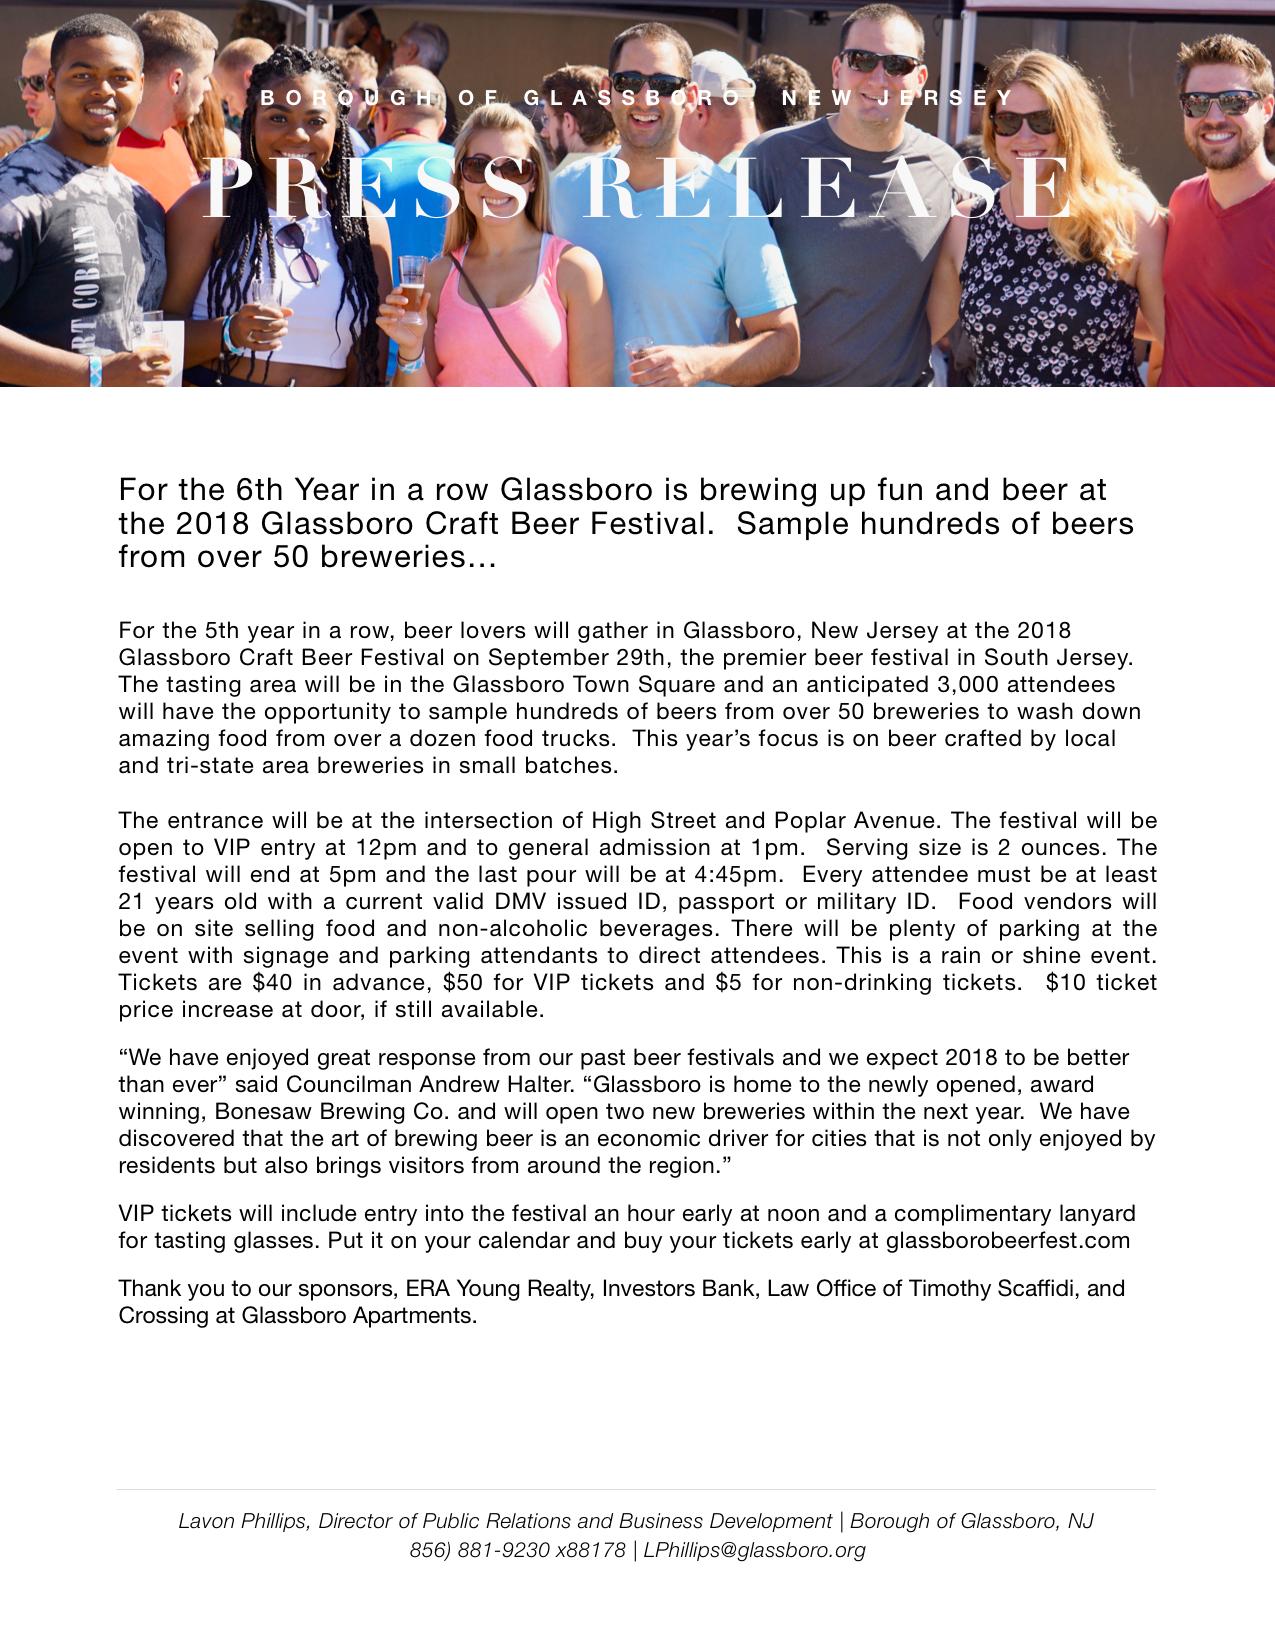 Glassboro NJ Press release CRAFT BEER FESTIVAL 2018.jpeg